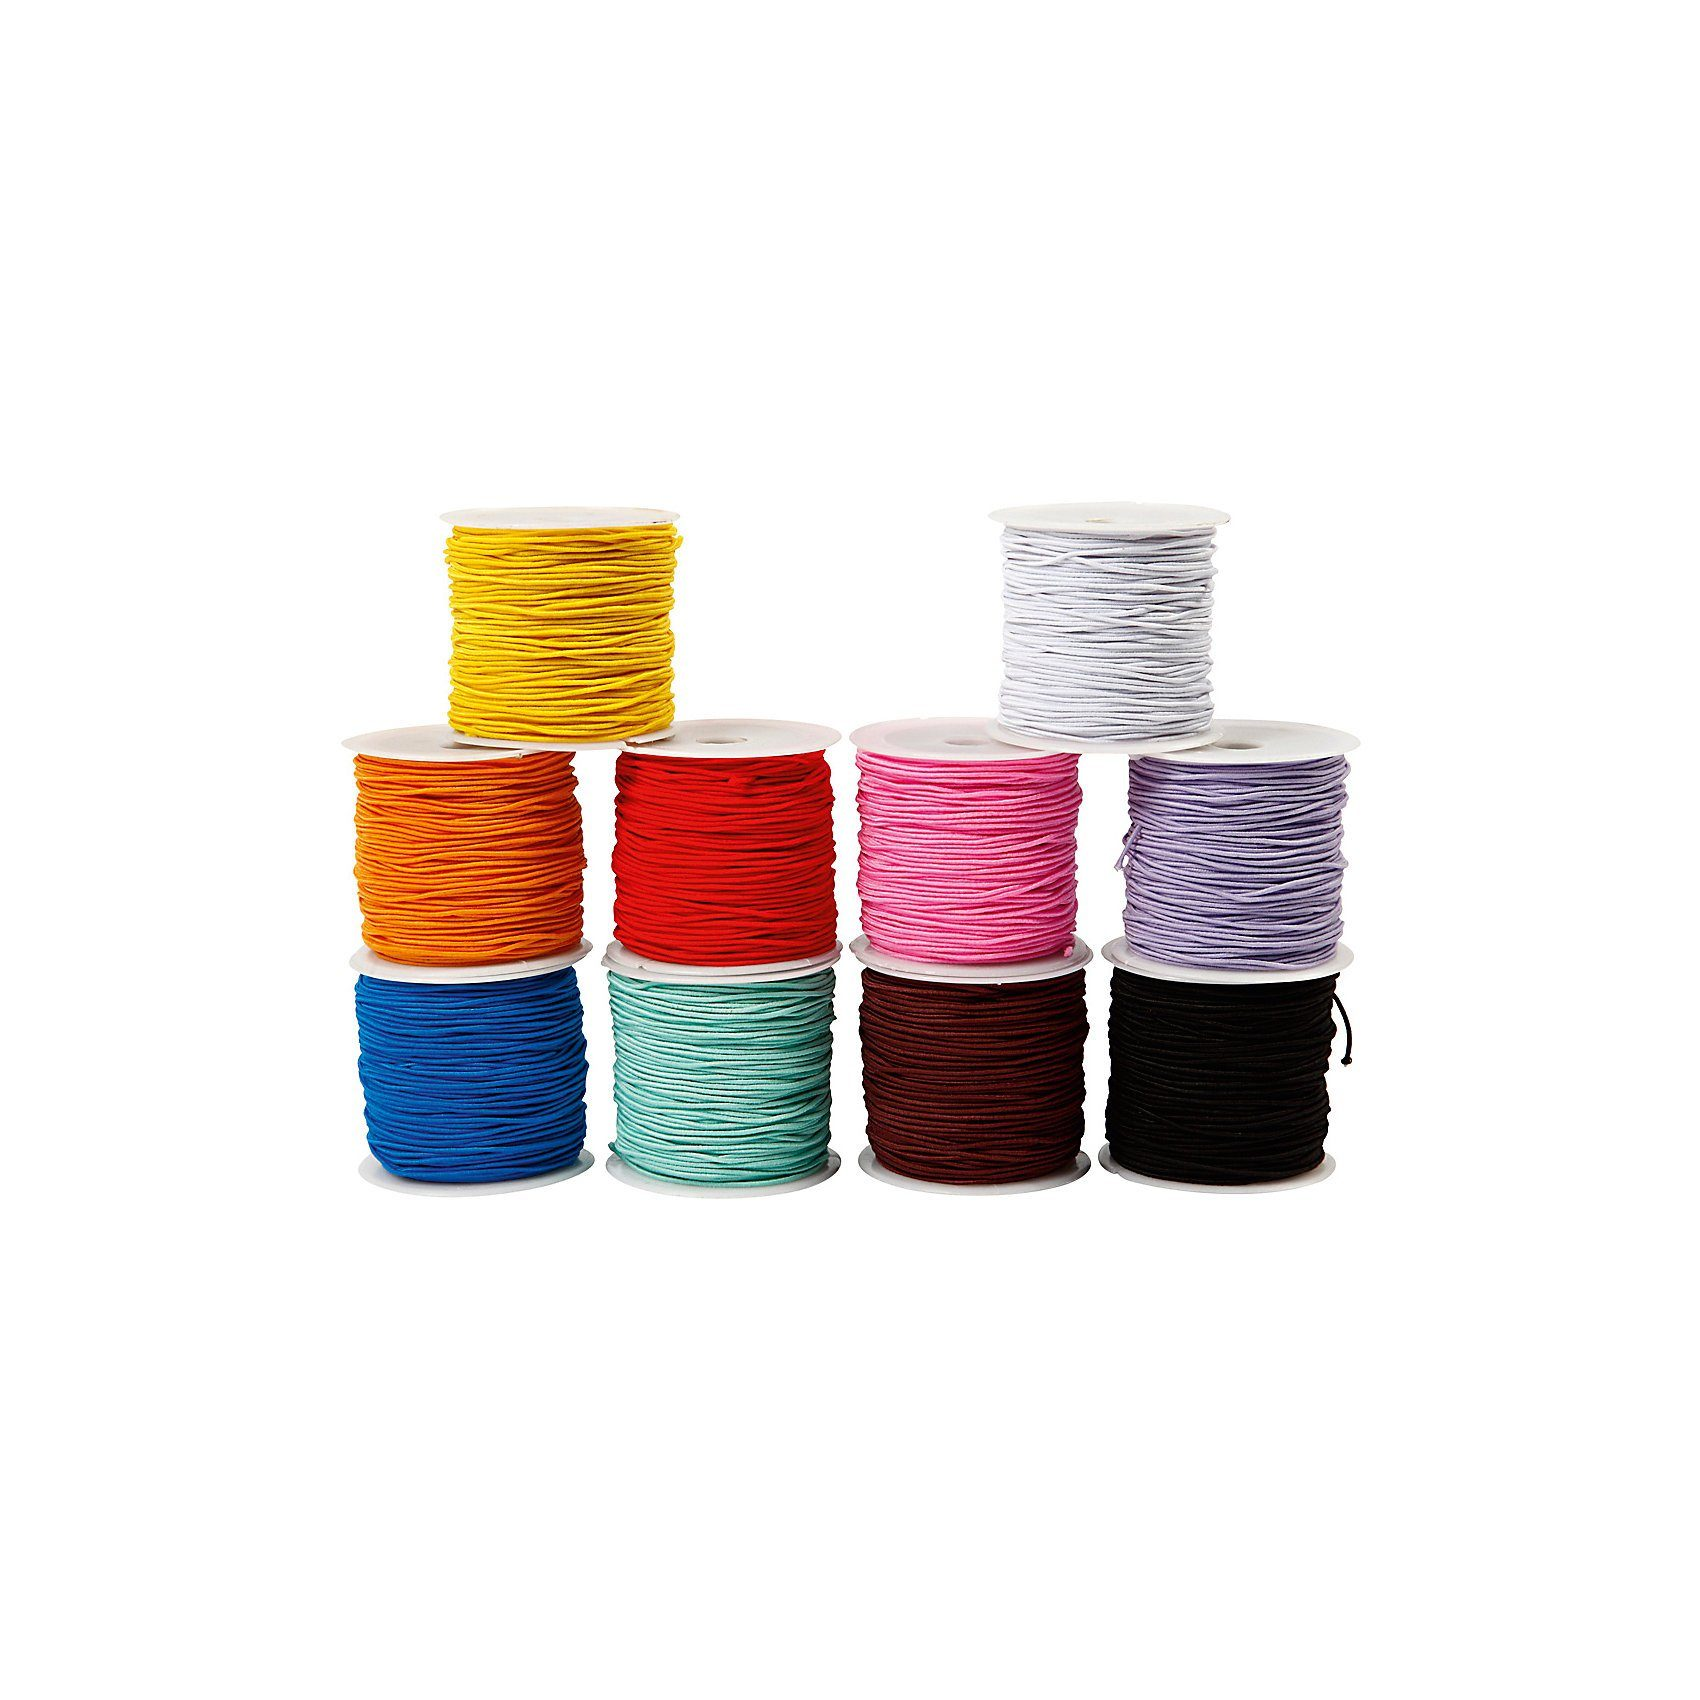 Elastikband, Stärke: 1 mm, 10x25 m